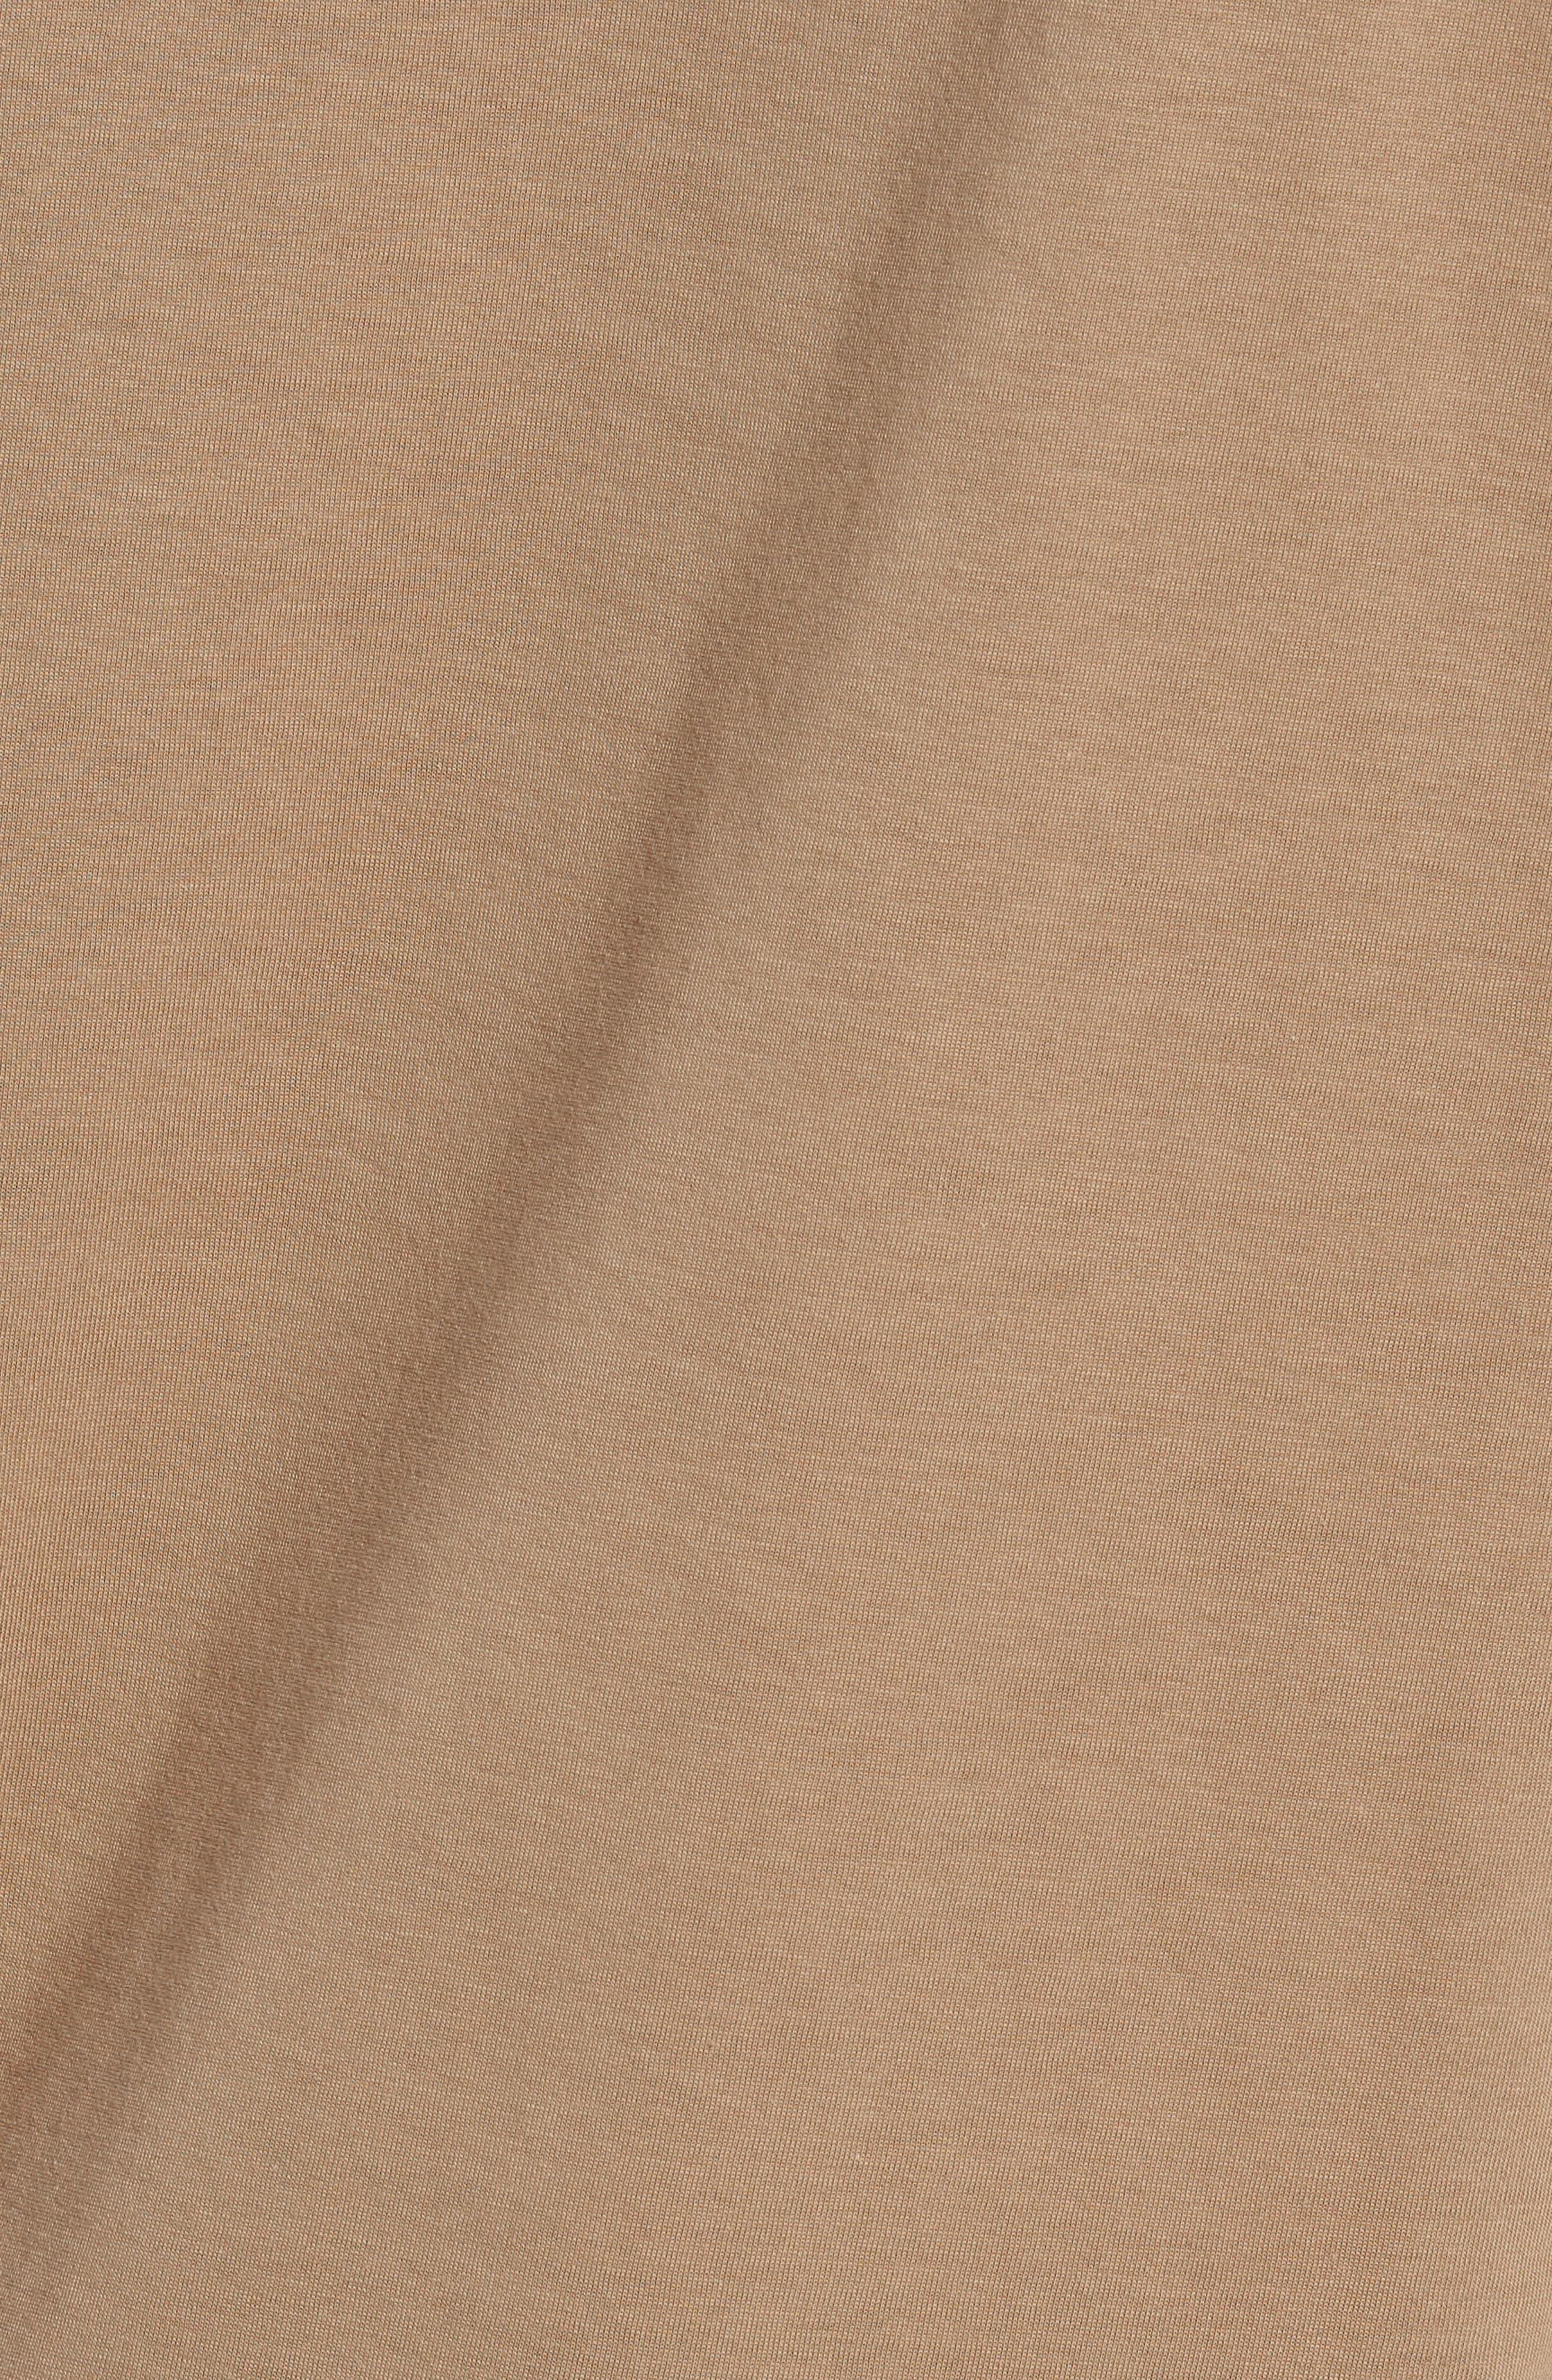 Pima Cotton T-Shirt,                             Alternate thumbnail 5, color,                             KRAFT BEIGE